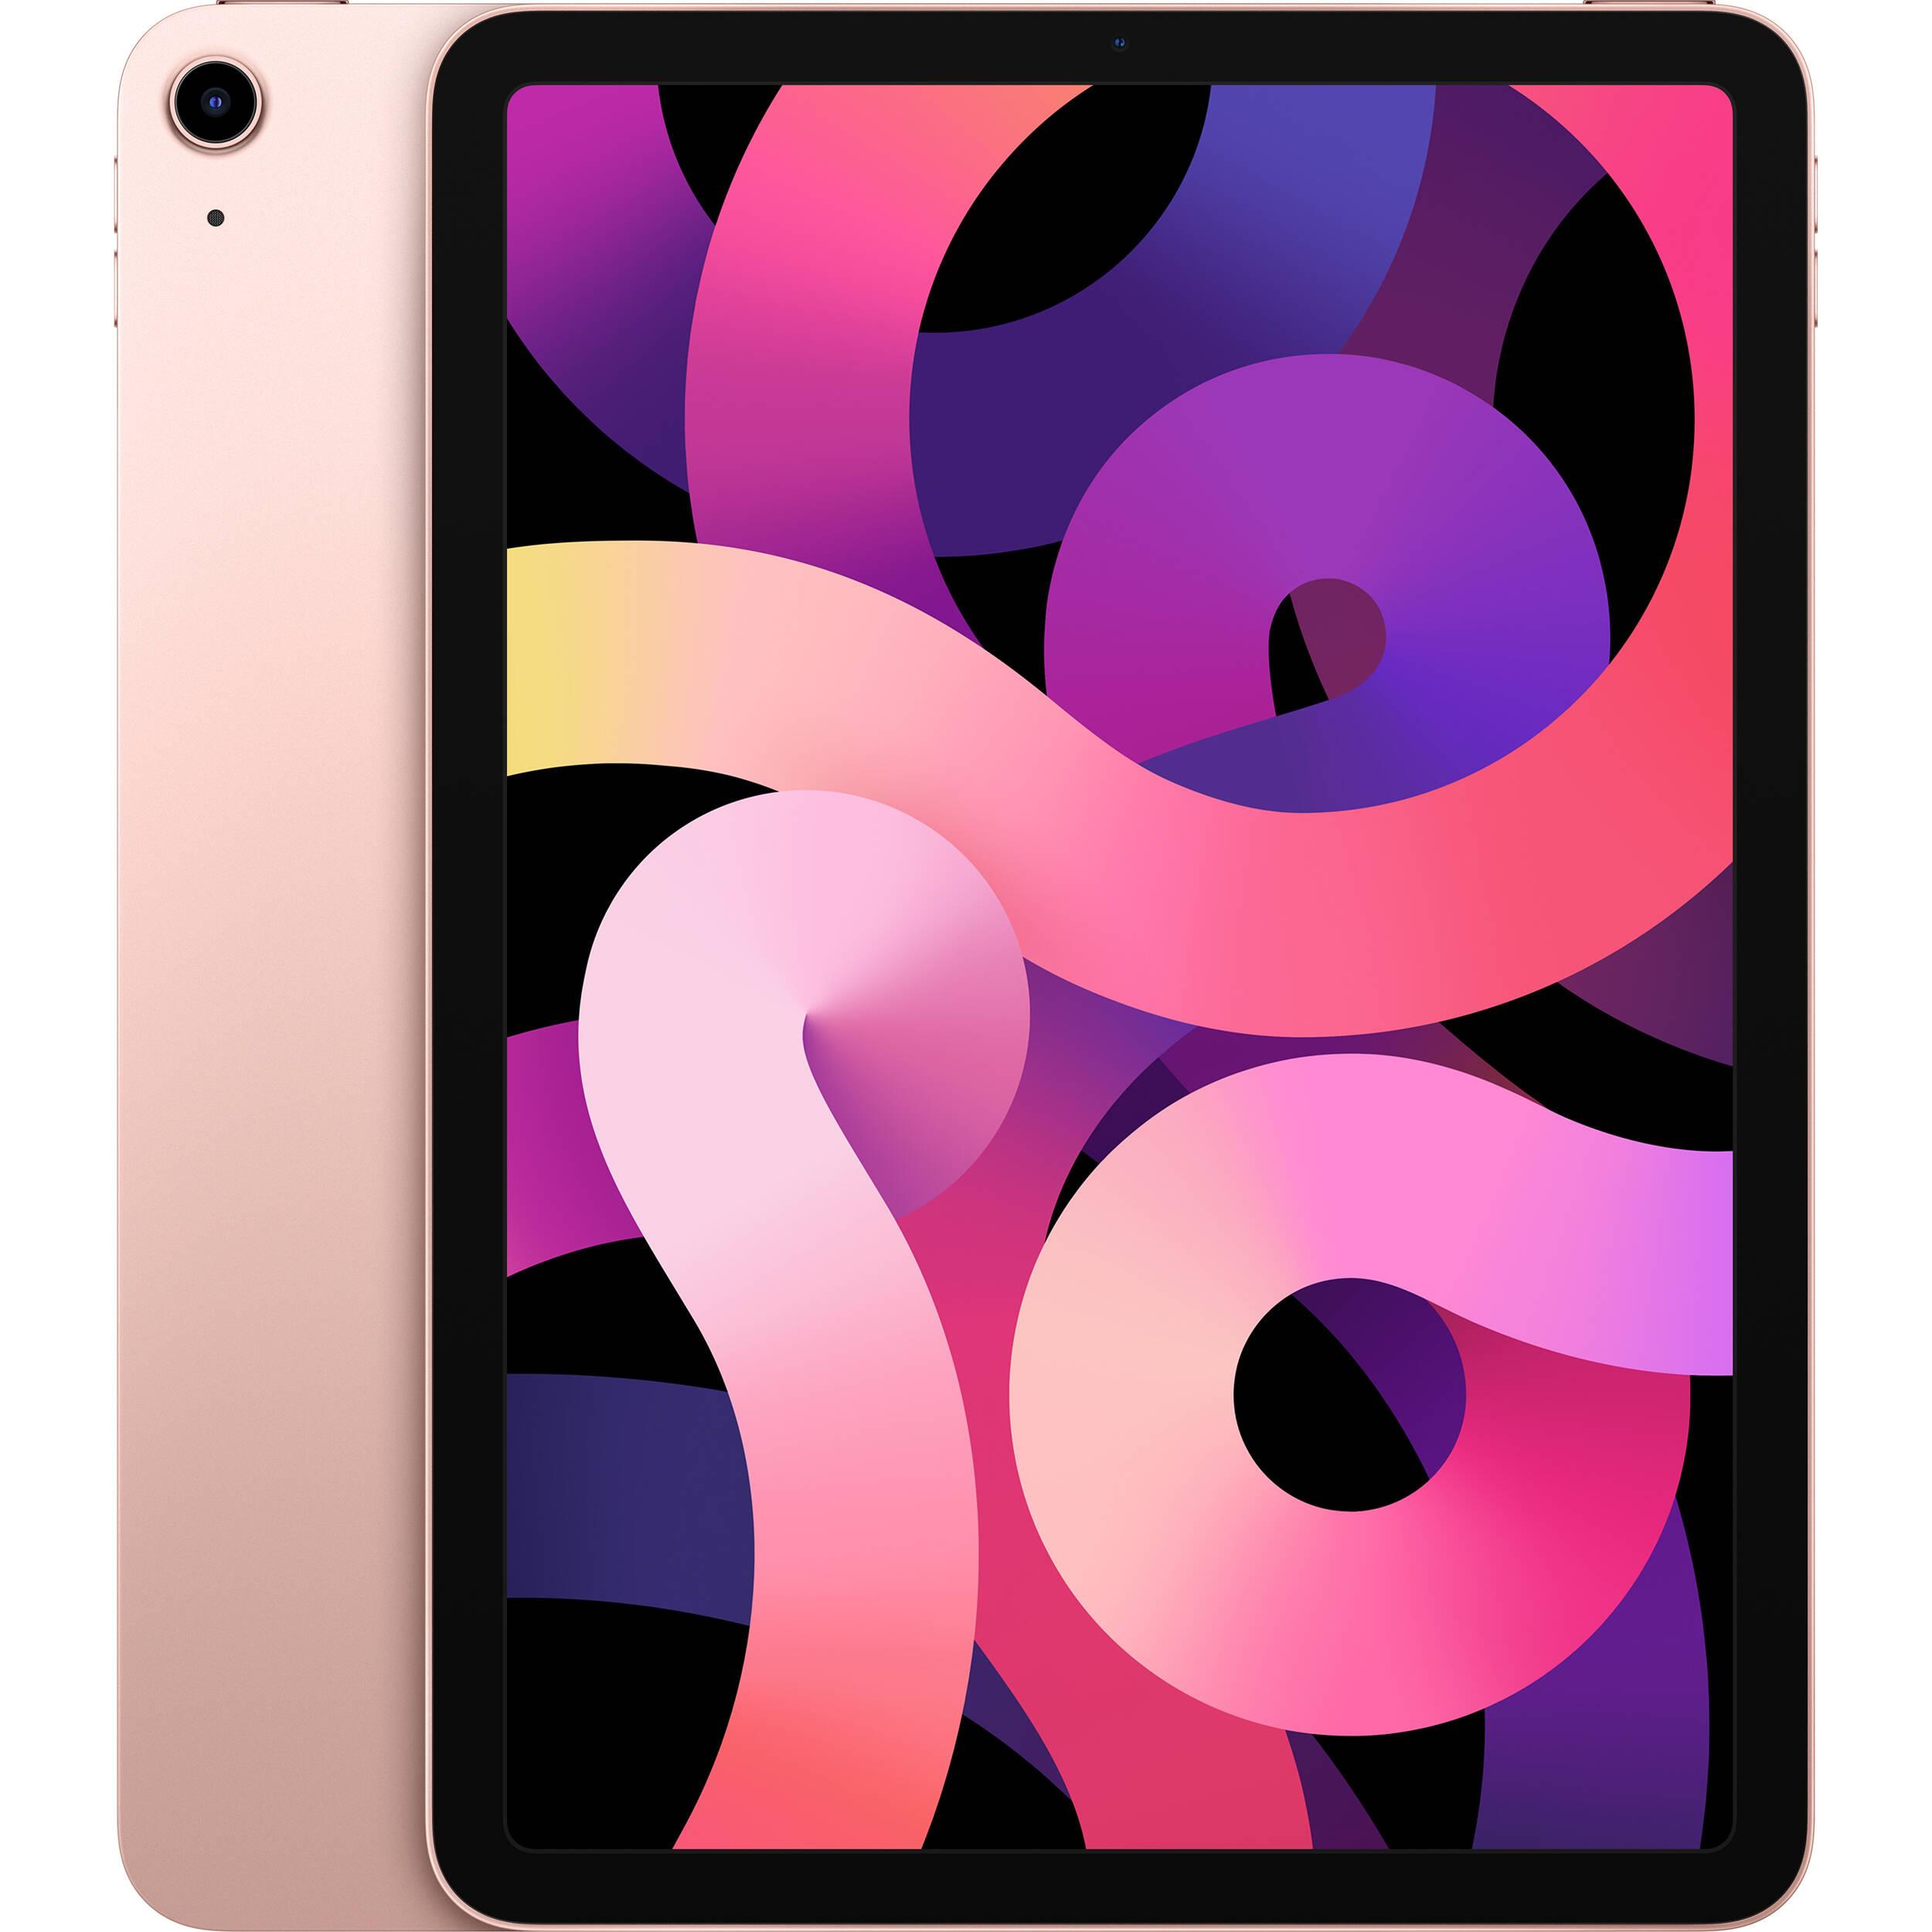 تبلت اپل مدل iPad Air 10.9 inch 2020 WiFi ظرفیت 64 گیگابایت  main 1 10